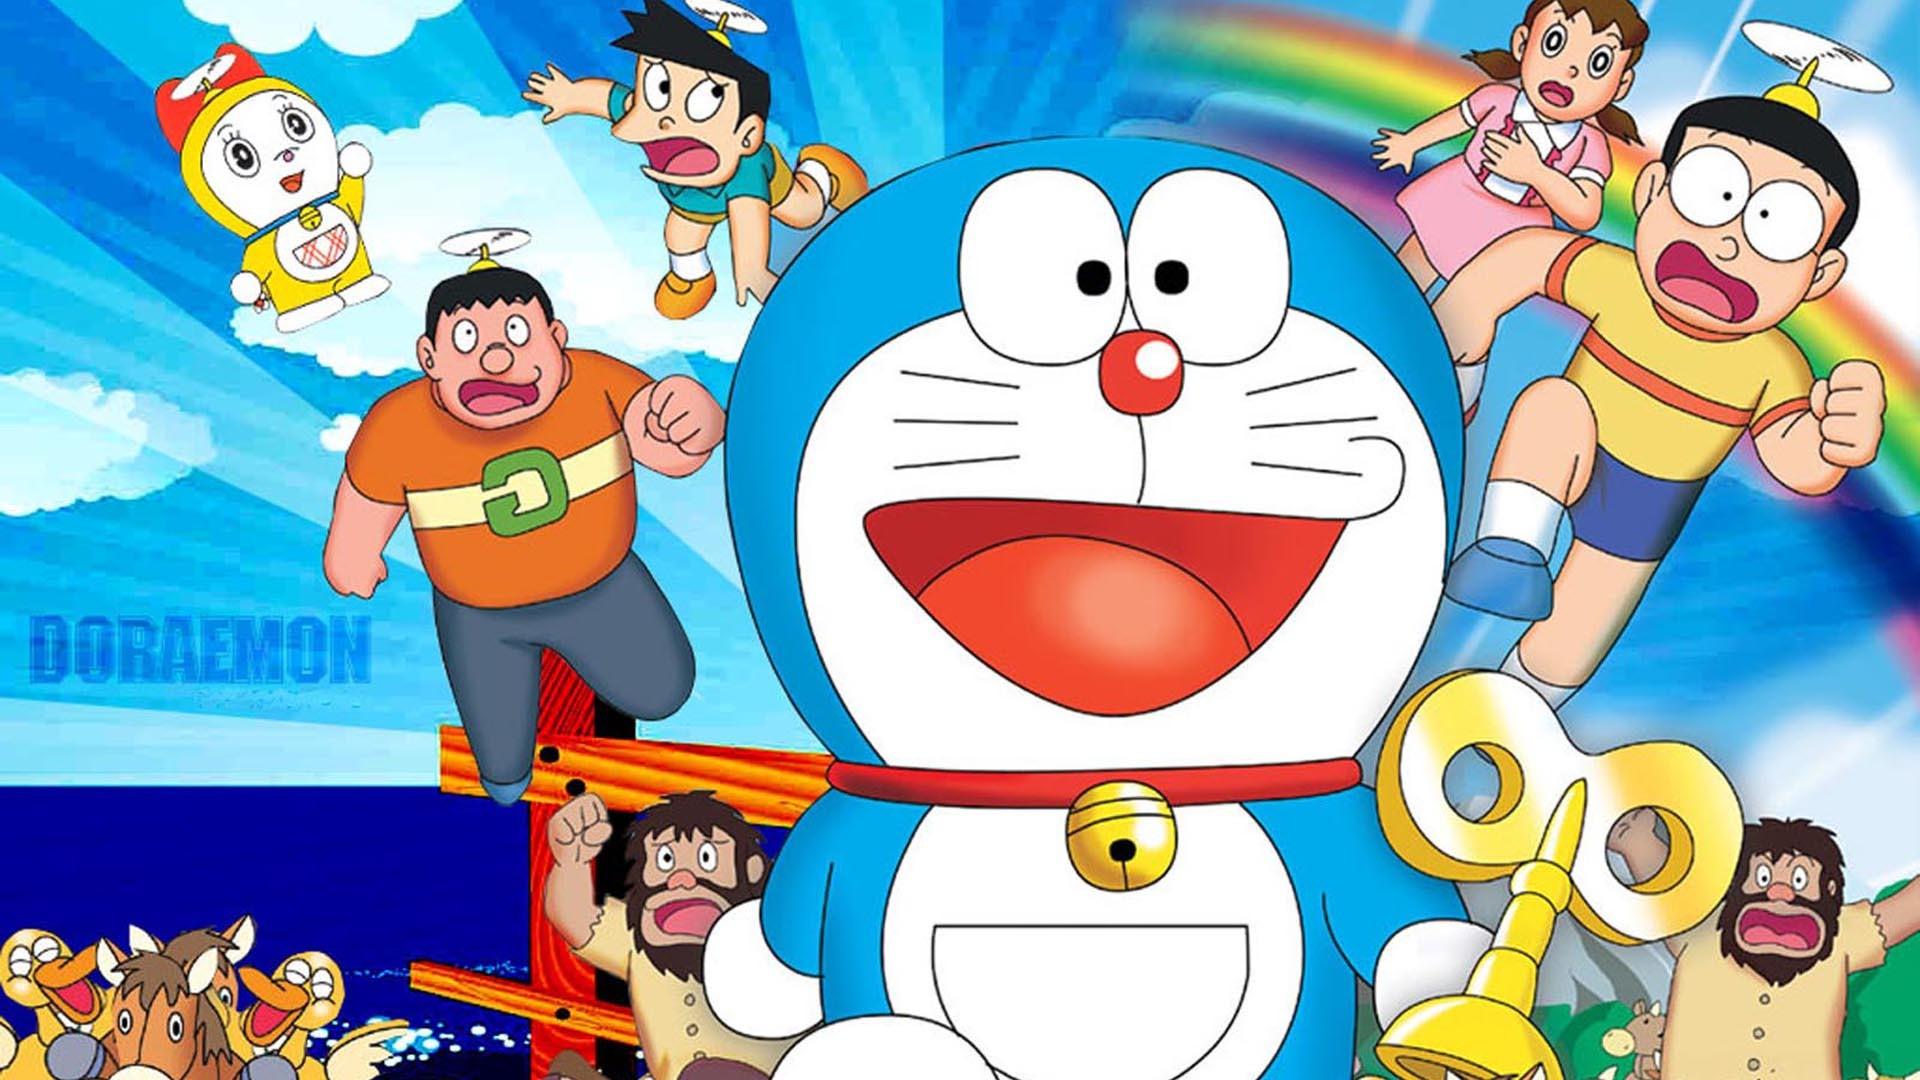 Download Wallpaper Doraemon